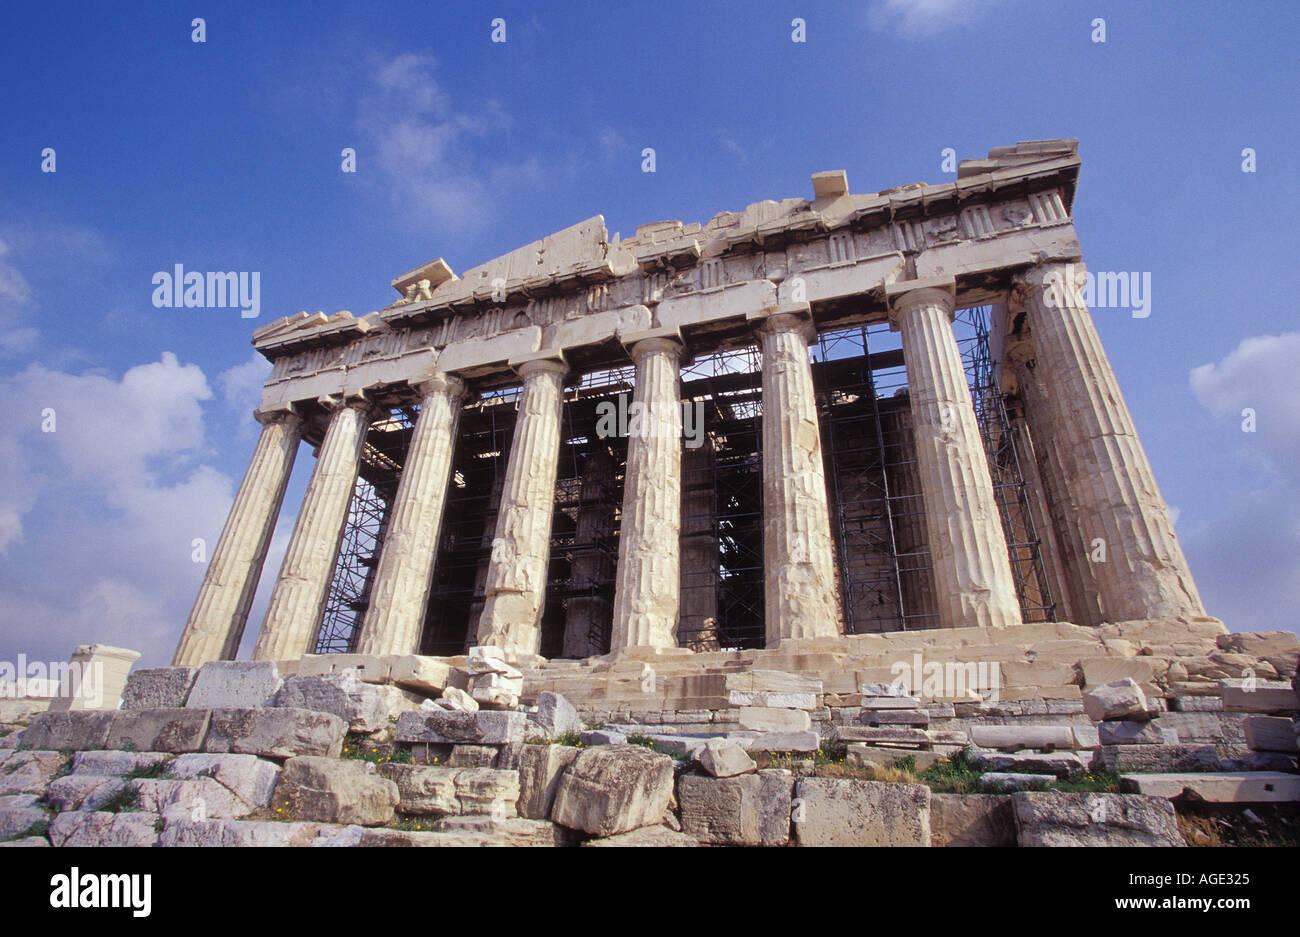 Greece Athens The Parthenon the main temple